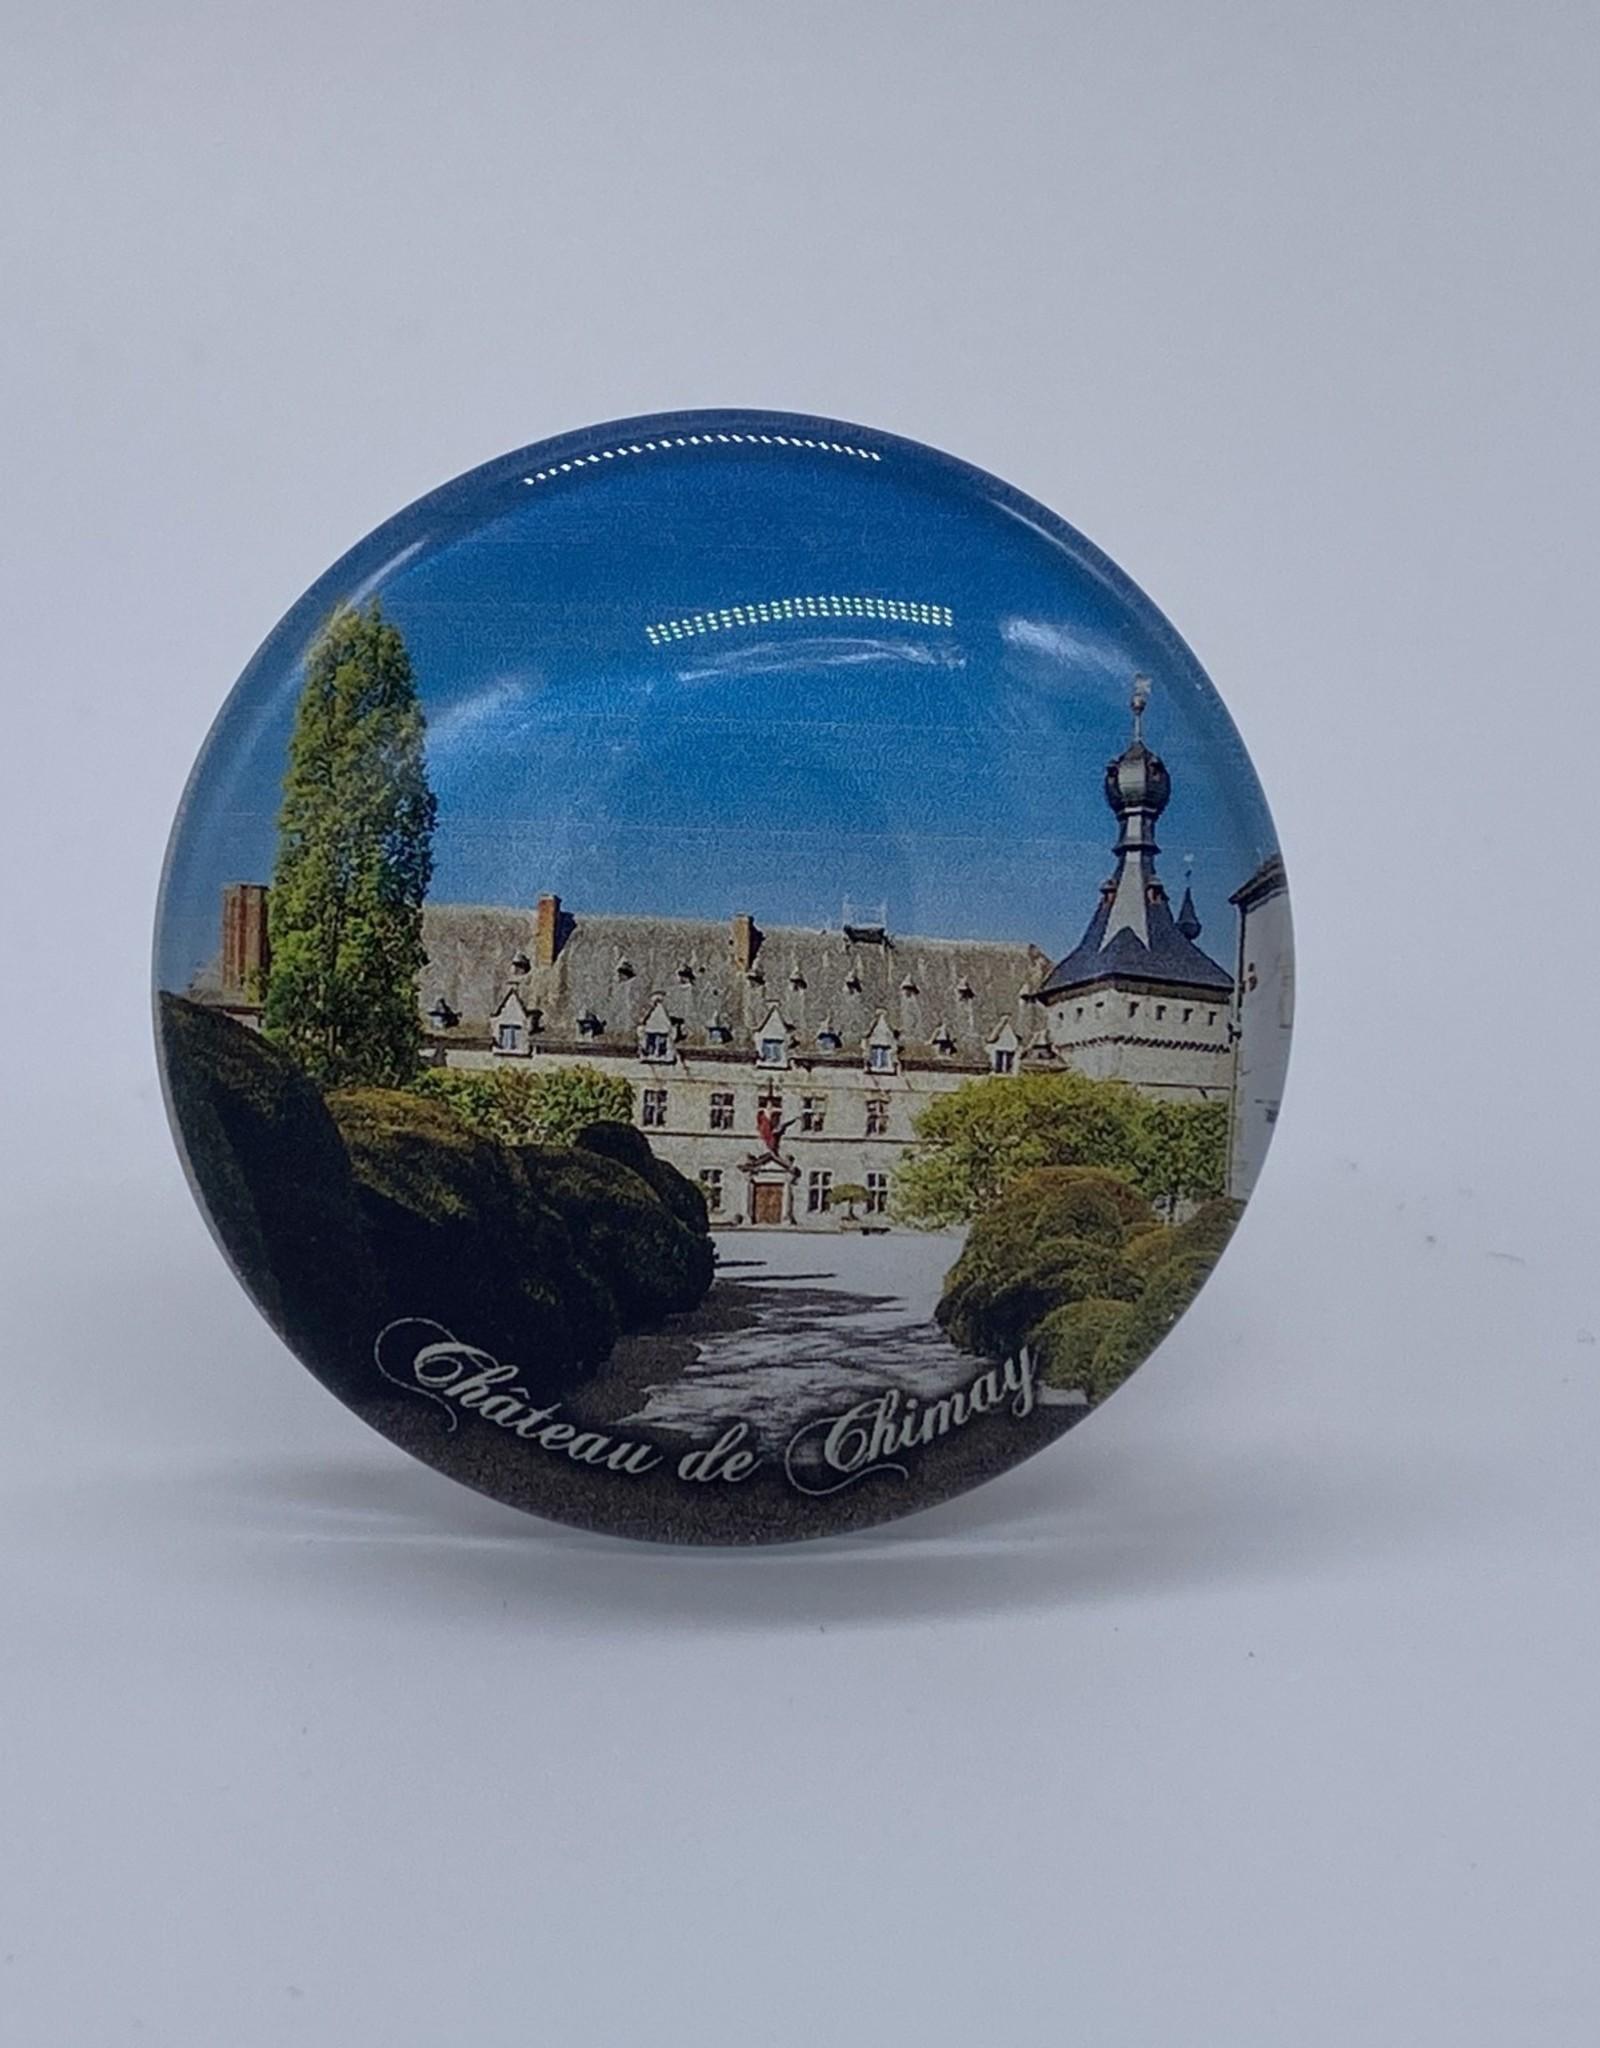 Château de Chimay Magnet globe acryl Château de Chimay